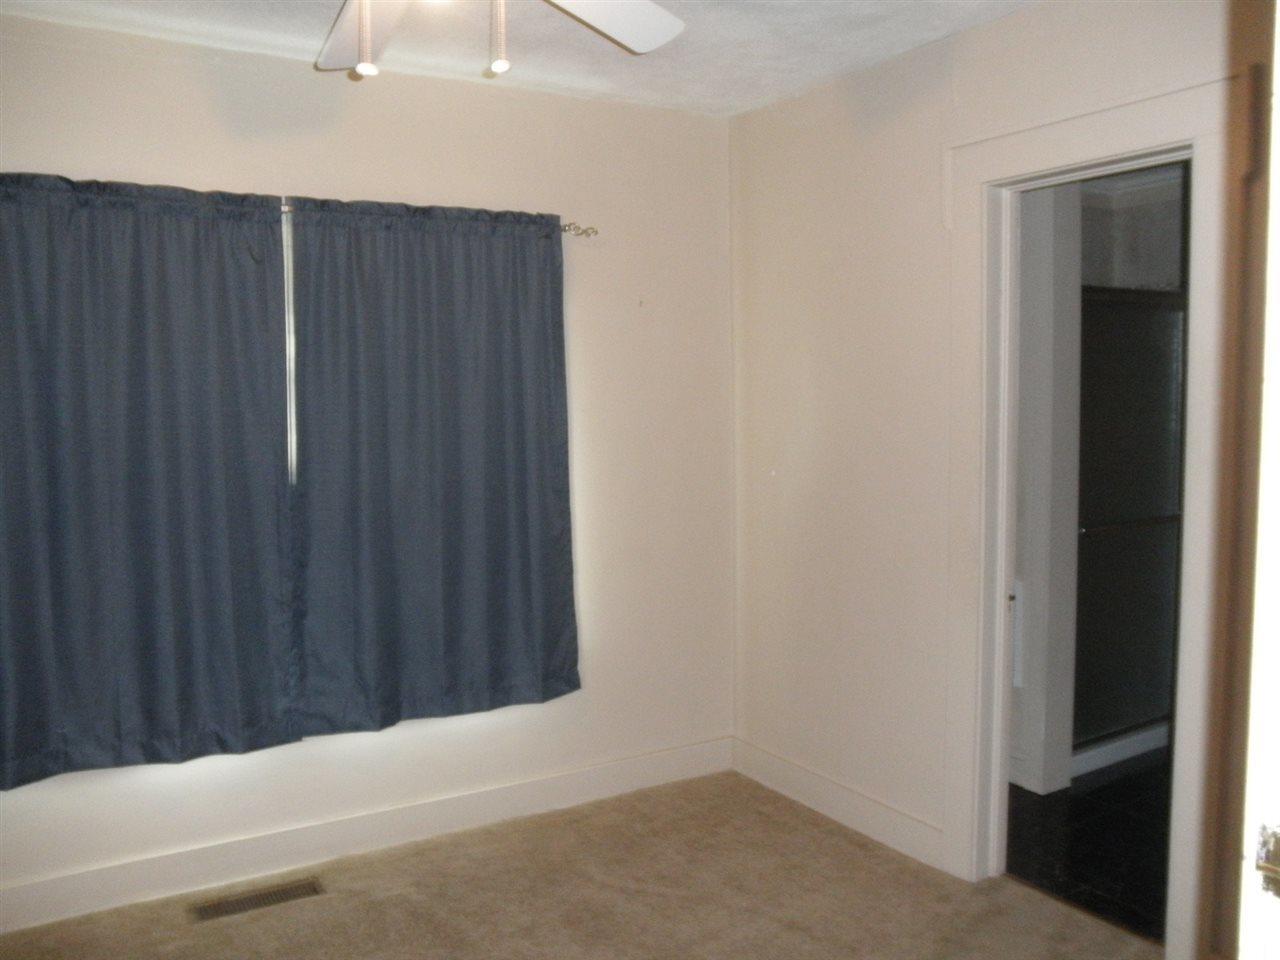 Sold Cross Sale W/ MLS | 1316 S 9th Ponca City, OK 74601 4